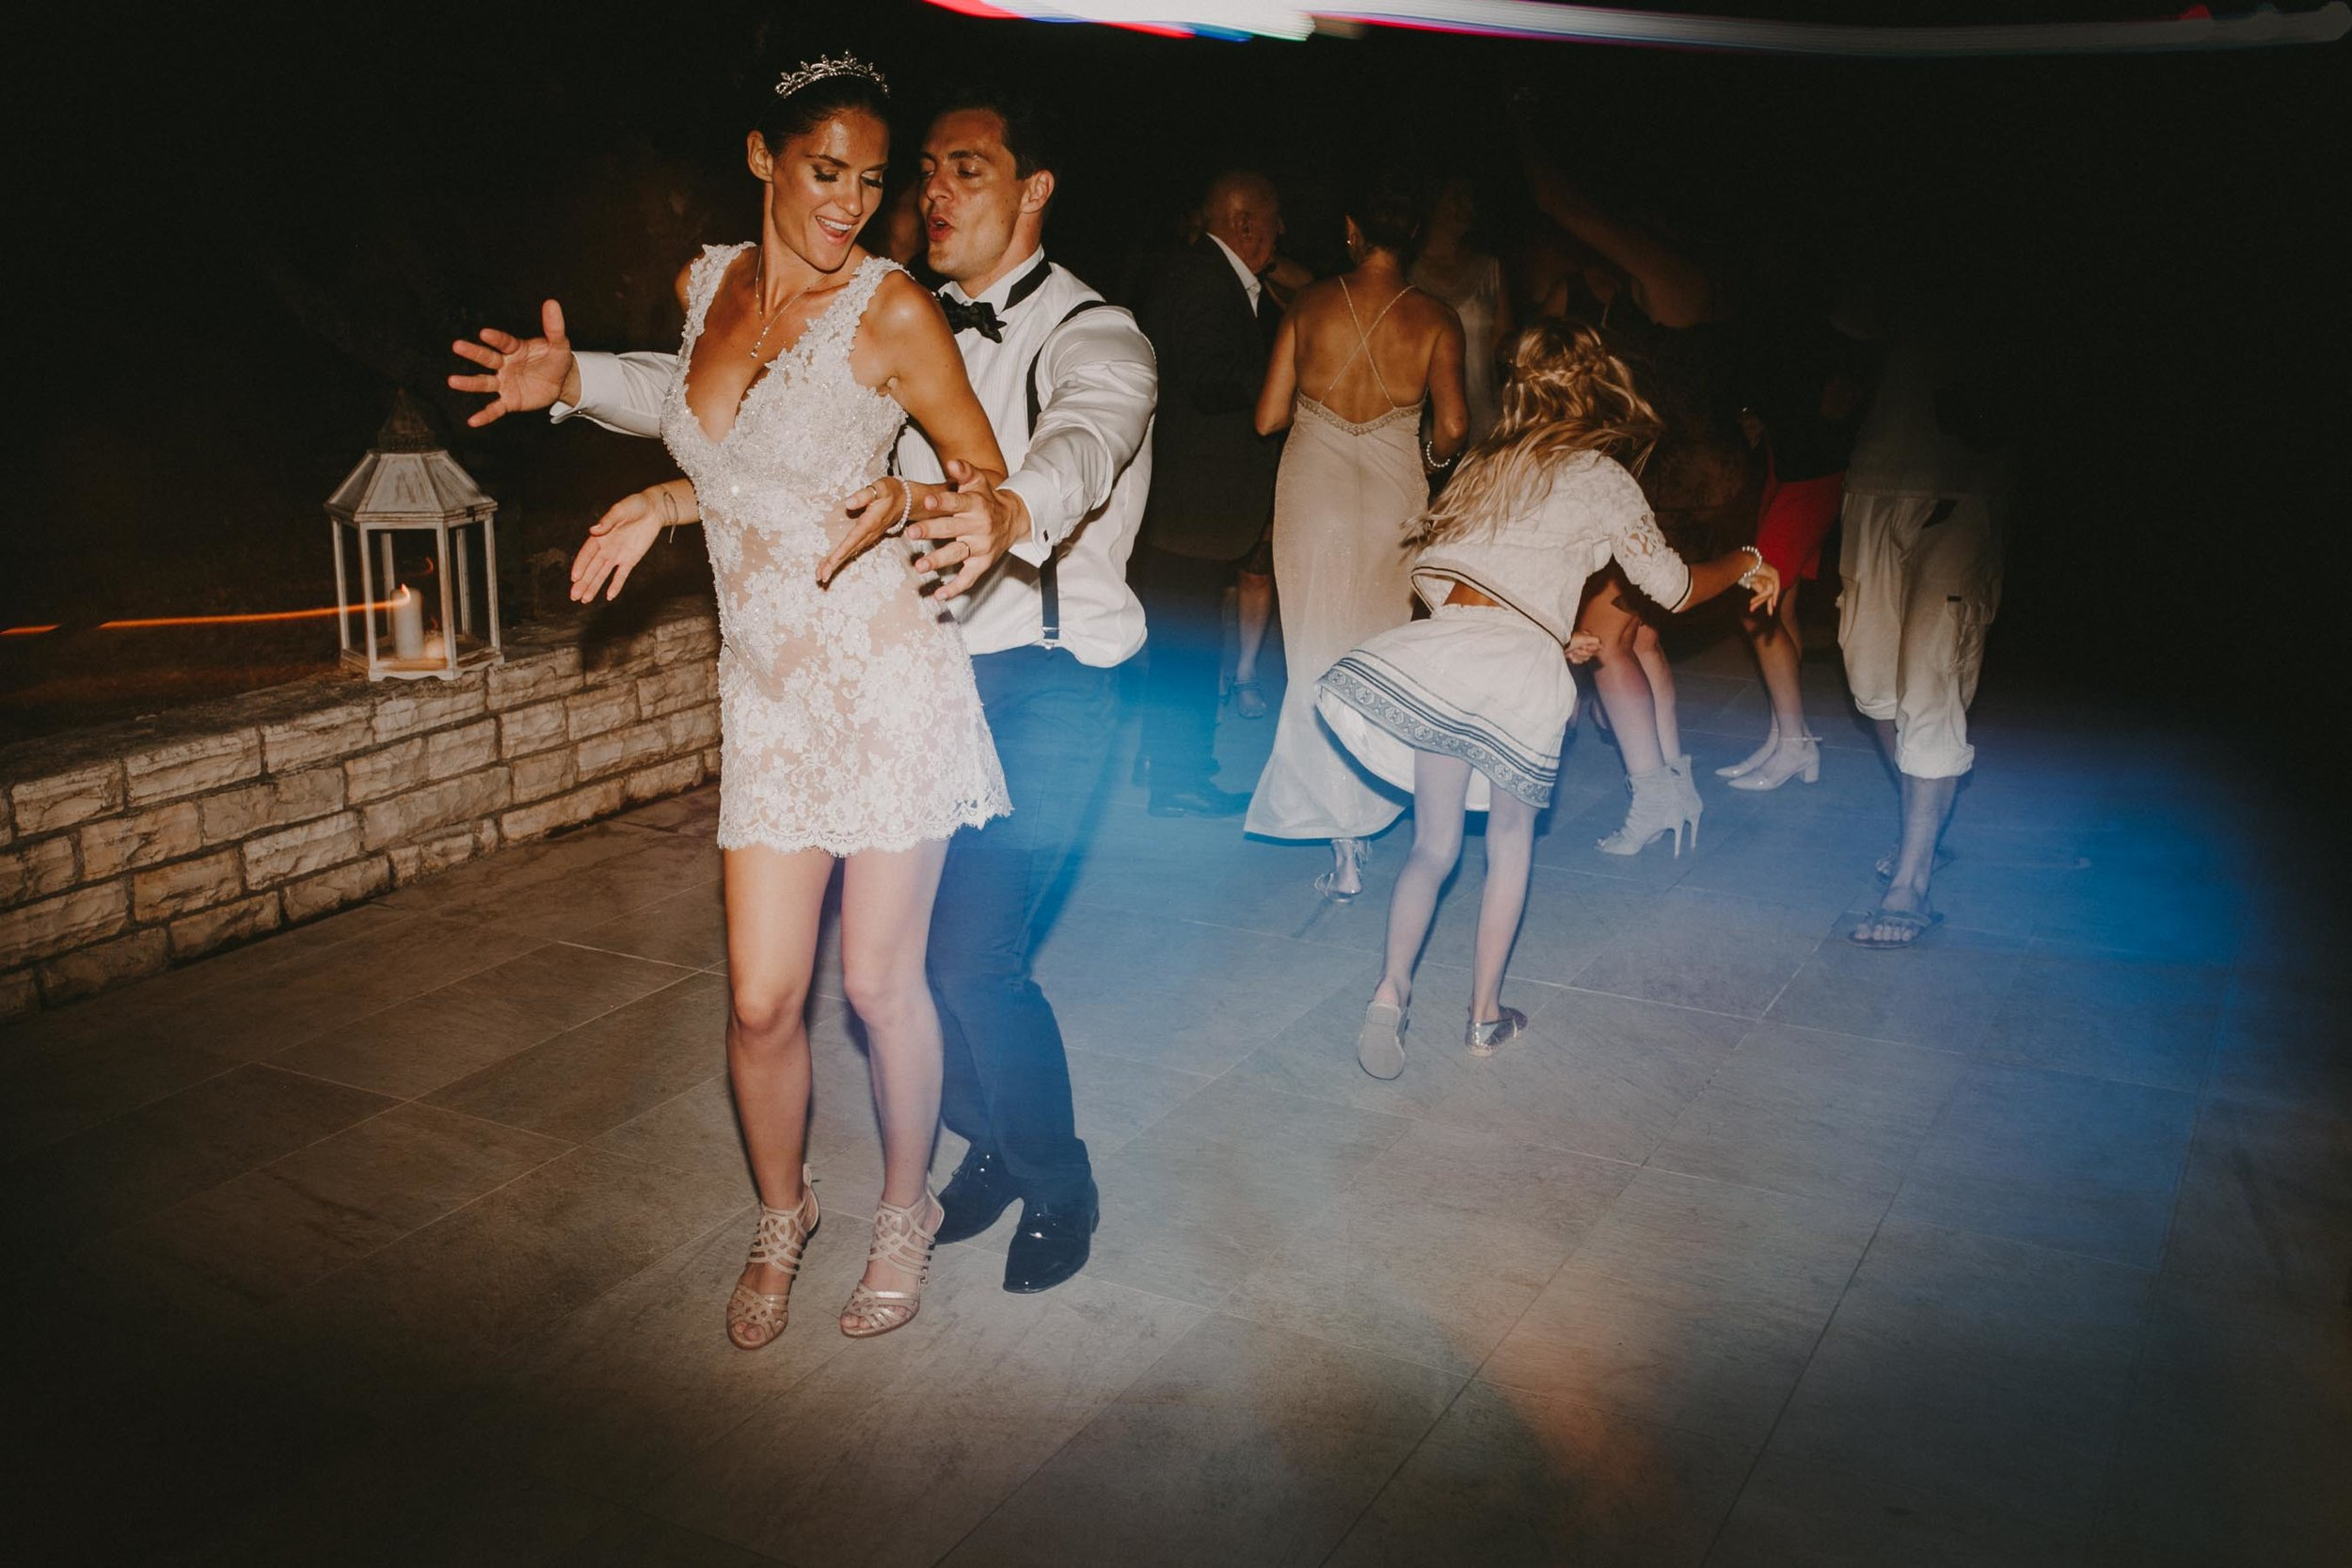 sylvia&dimitri-Wedding-Crvena_Luka-Croatia-119(0050).jpg